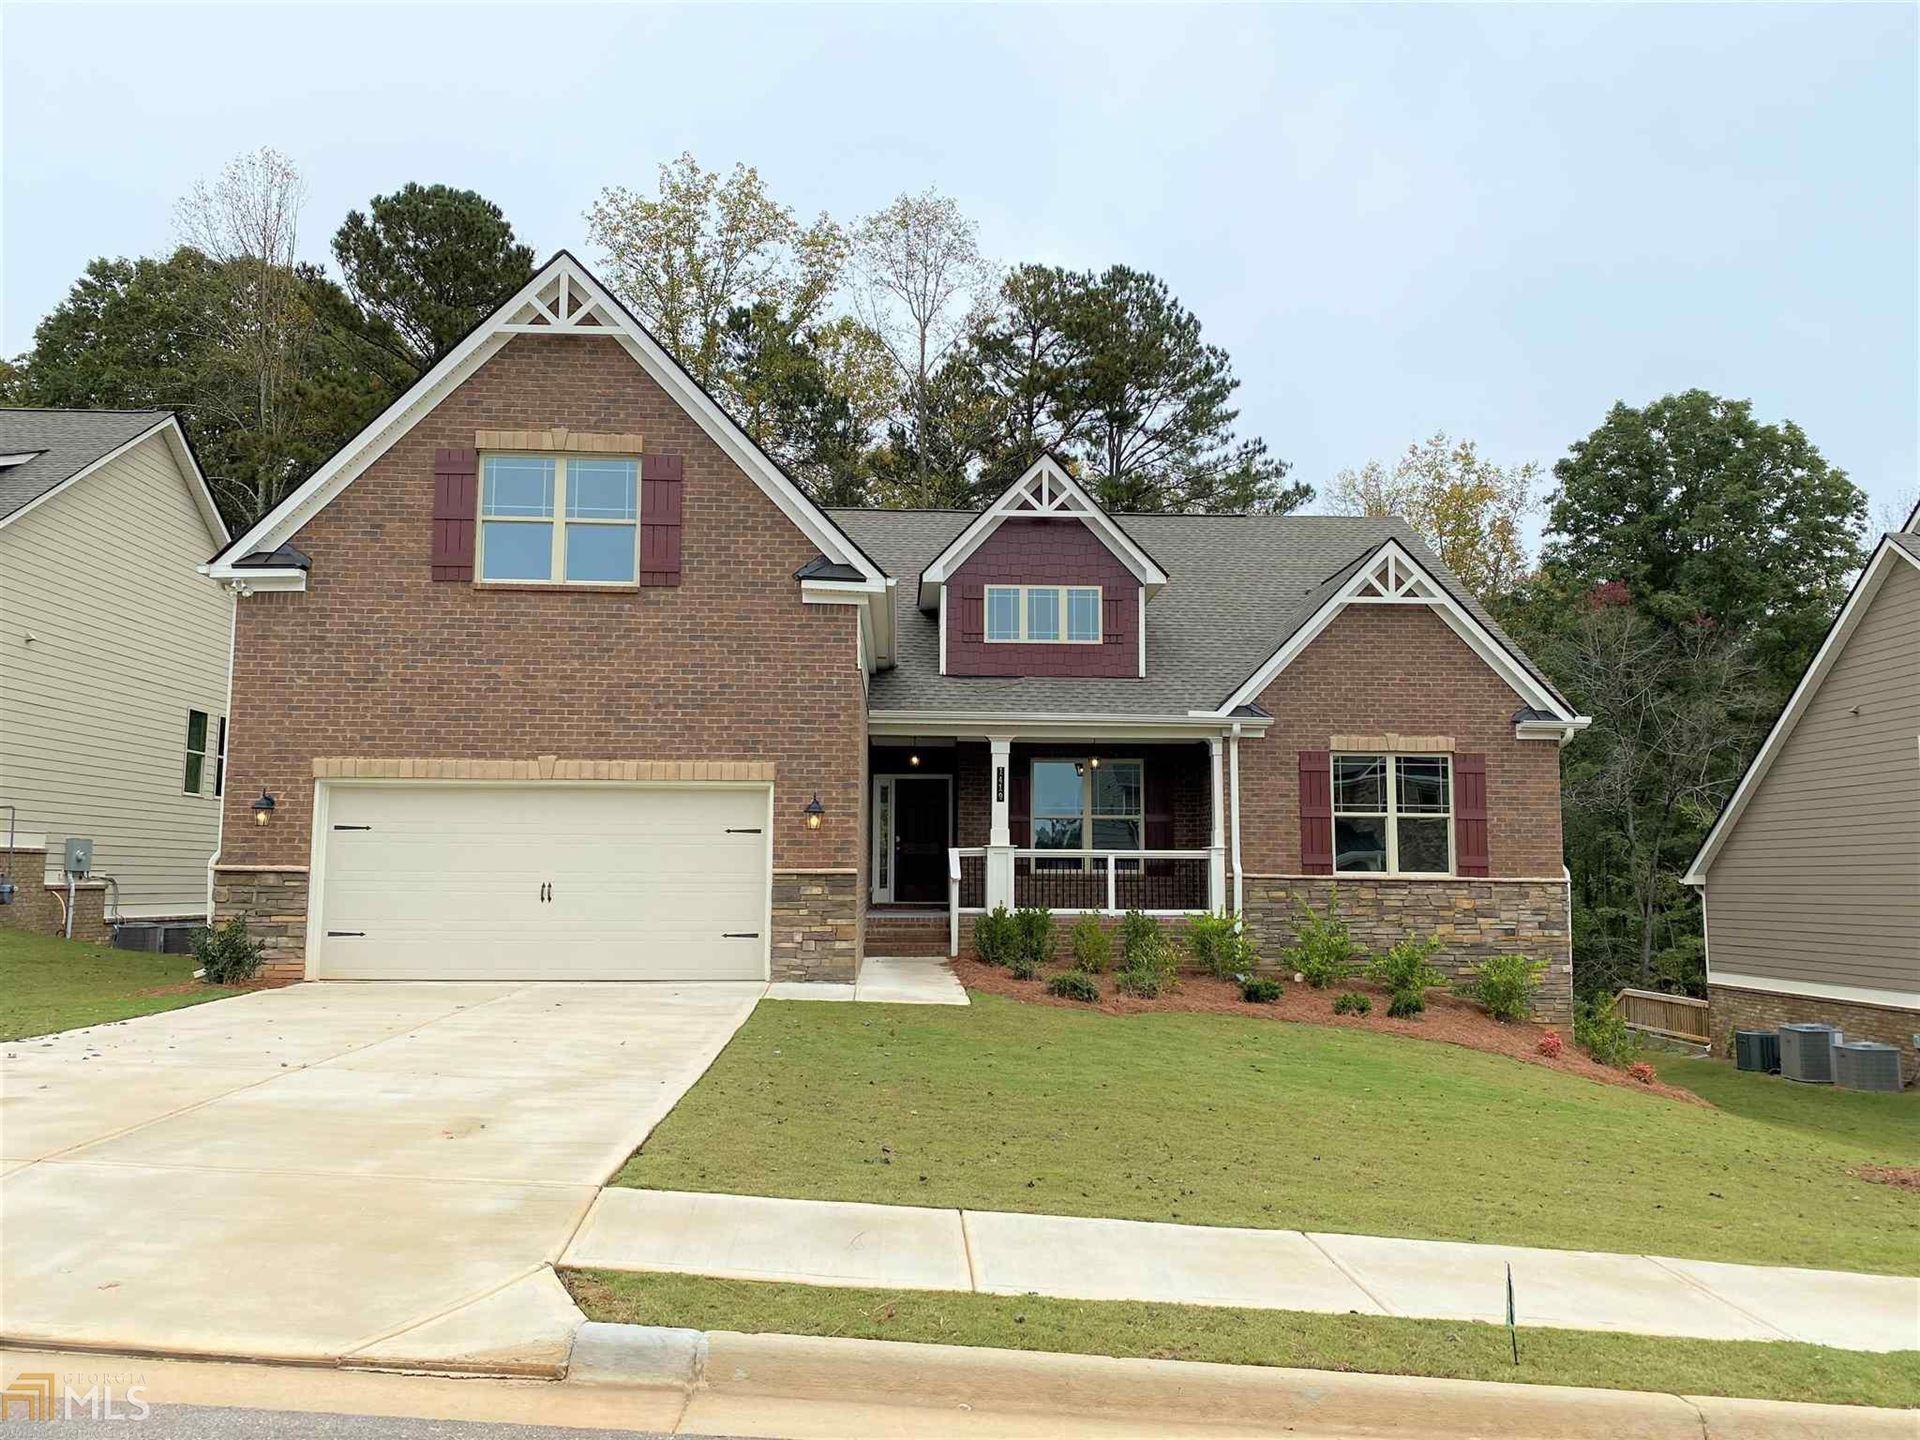 1419 Pond Overlook Dr, Auburn, GA 30011 - #: 8880867